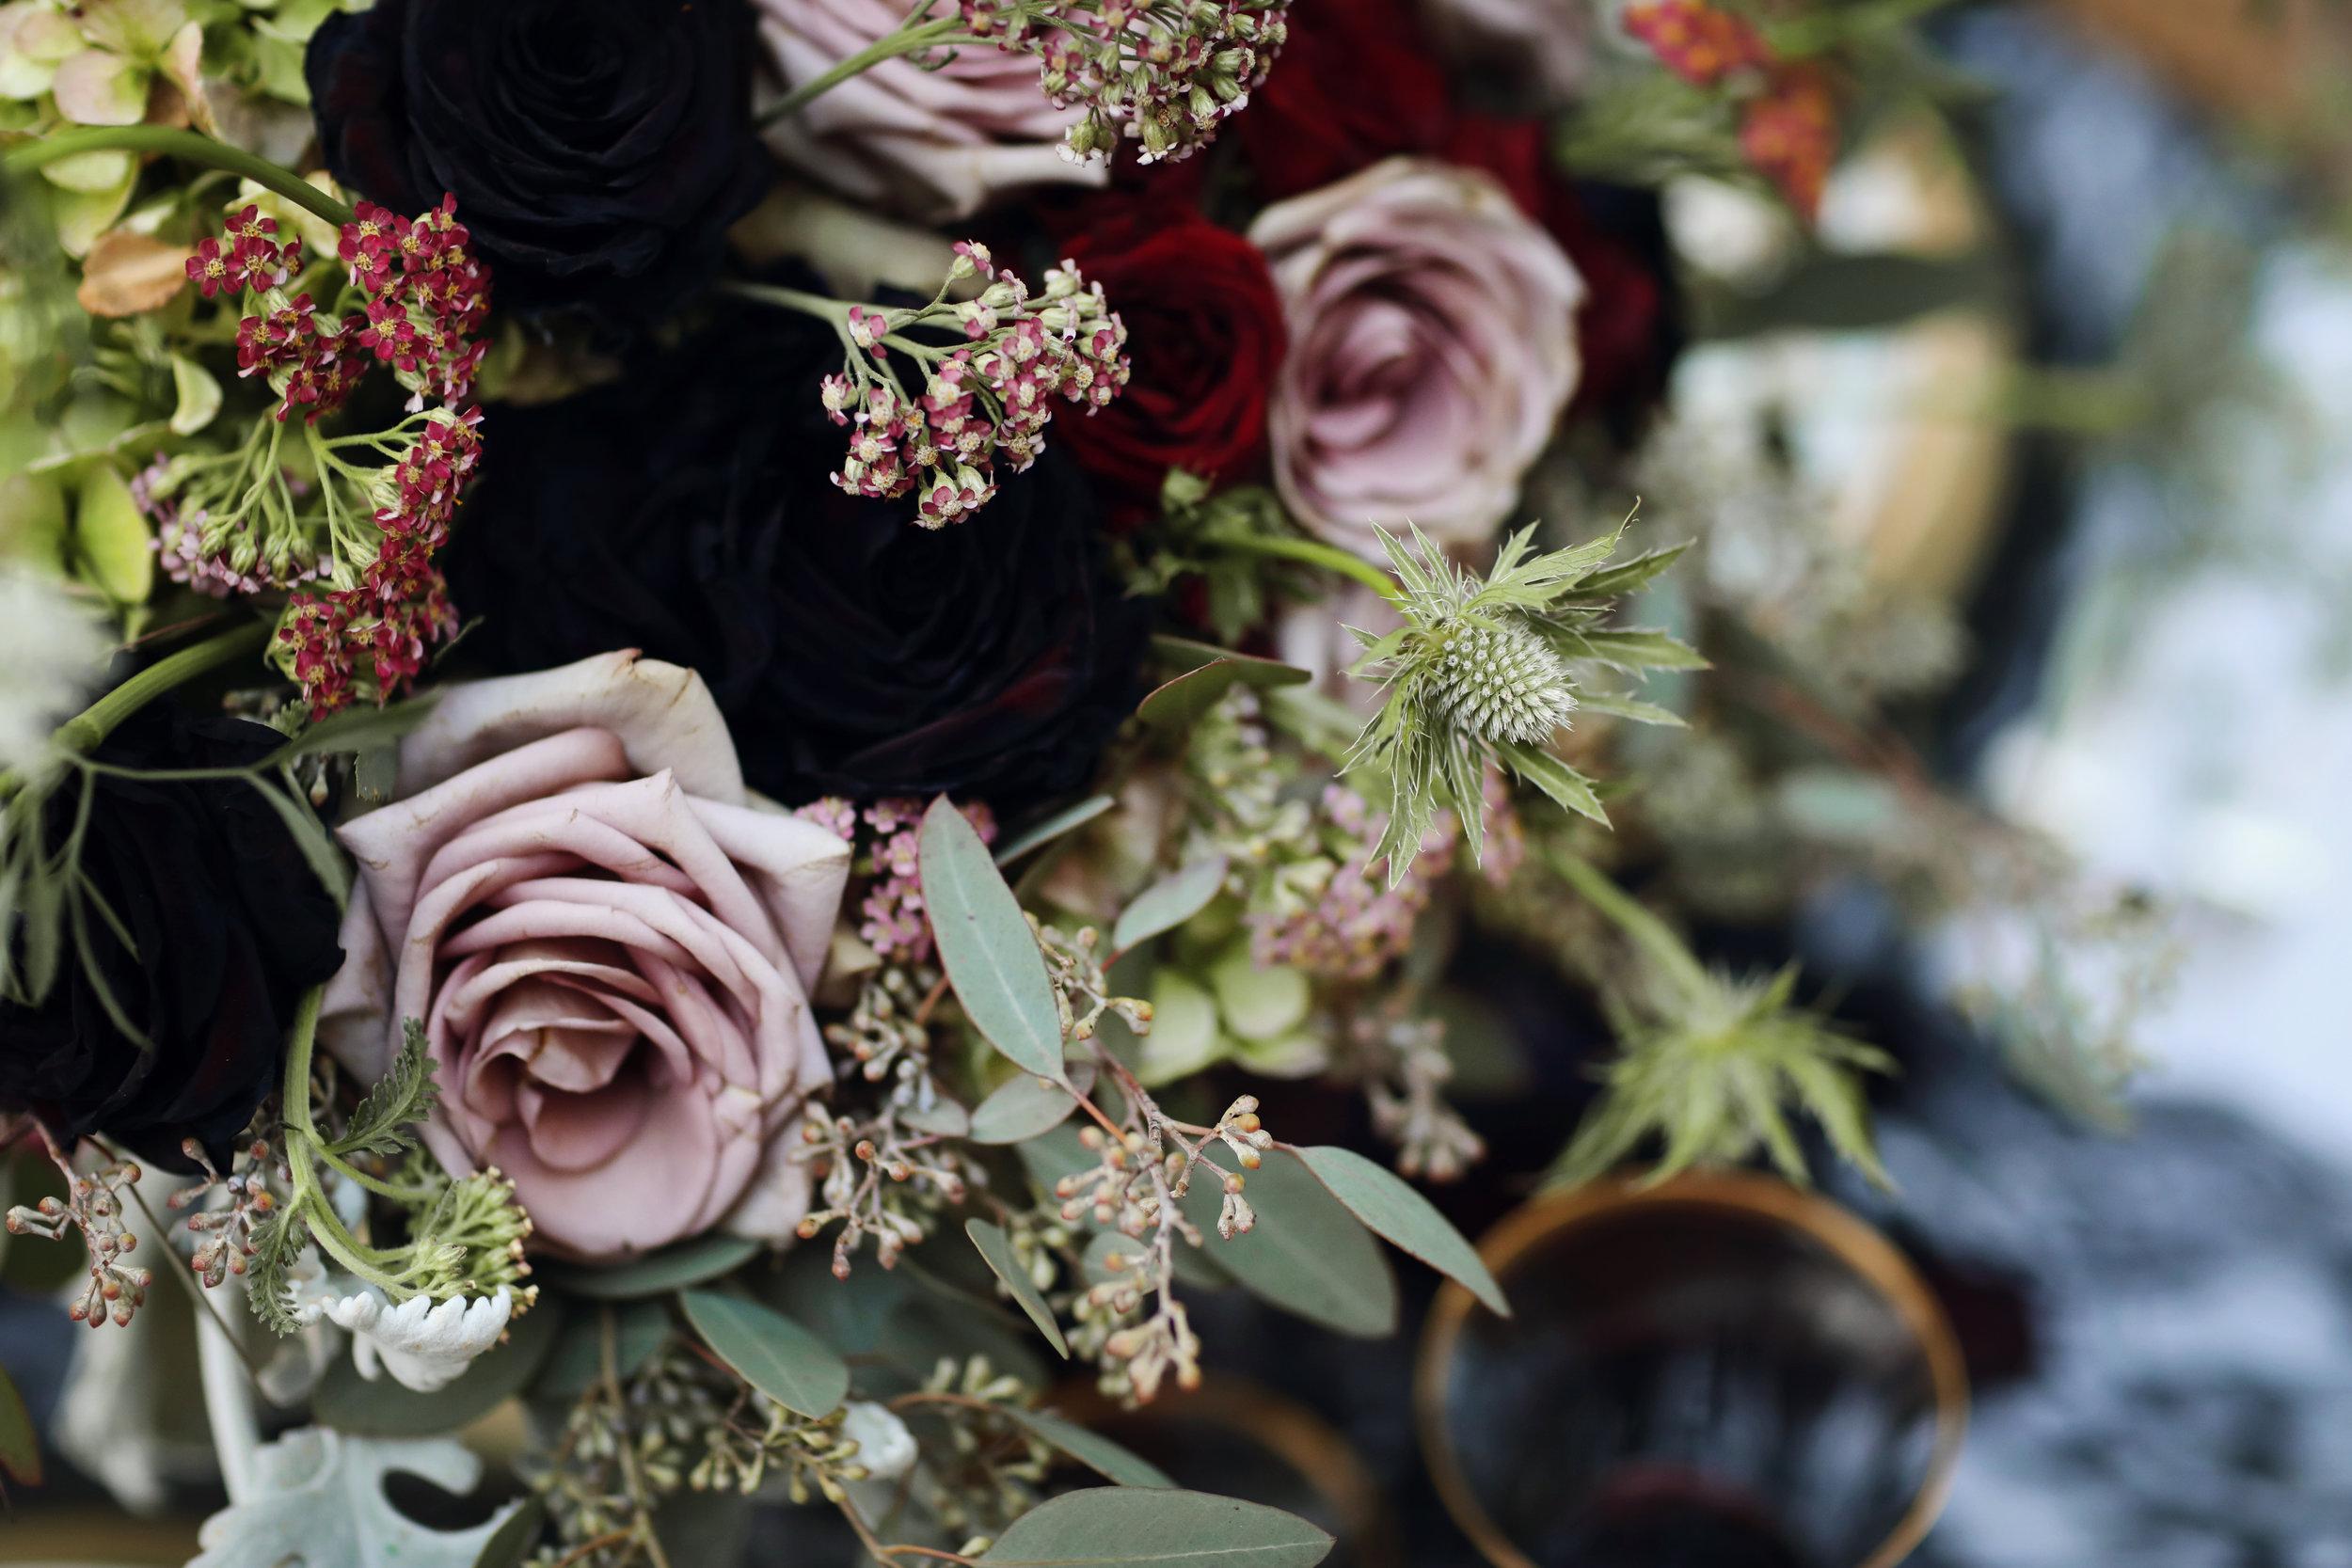 Floral bridal bouquet and centerpieces including a black dahlia.